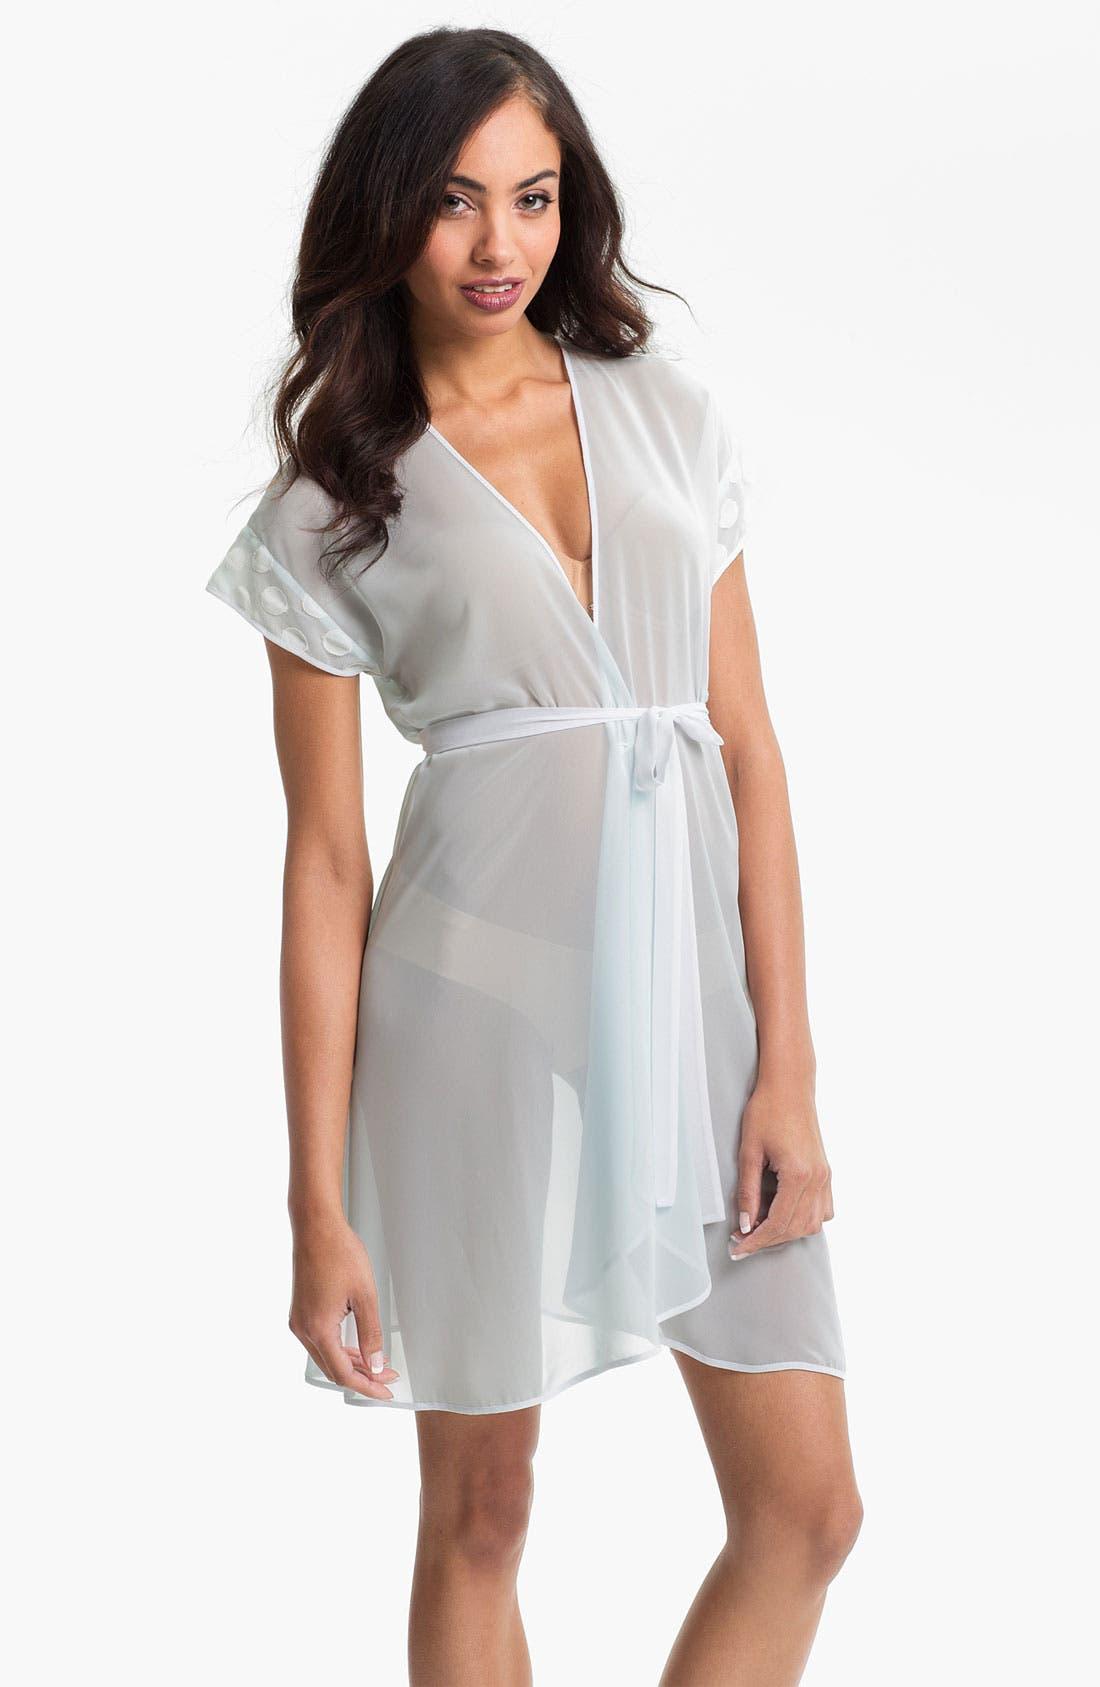 Alternate Image 1 Selected - Oscar de la Renta Sleepwear 'Sweet Dot' Short Sheer Robe